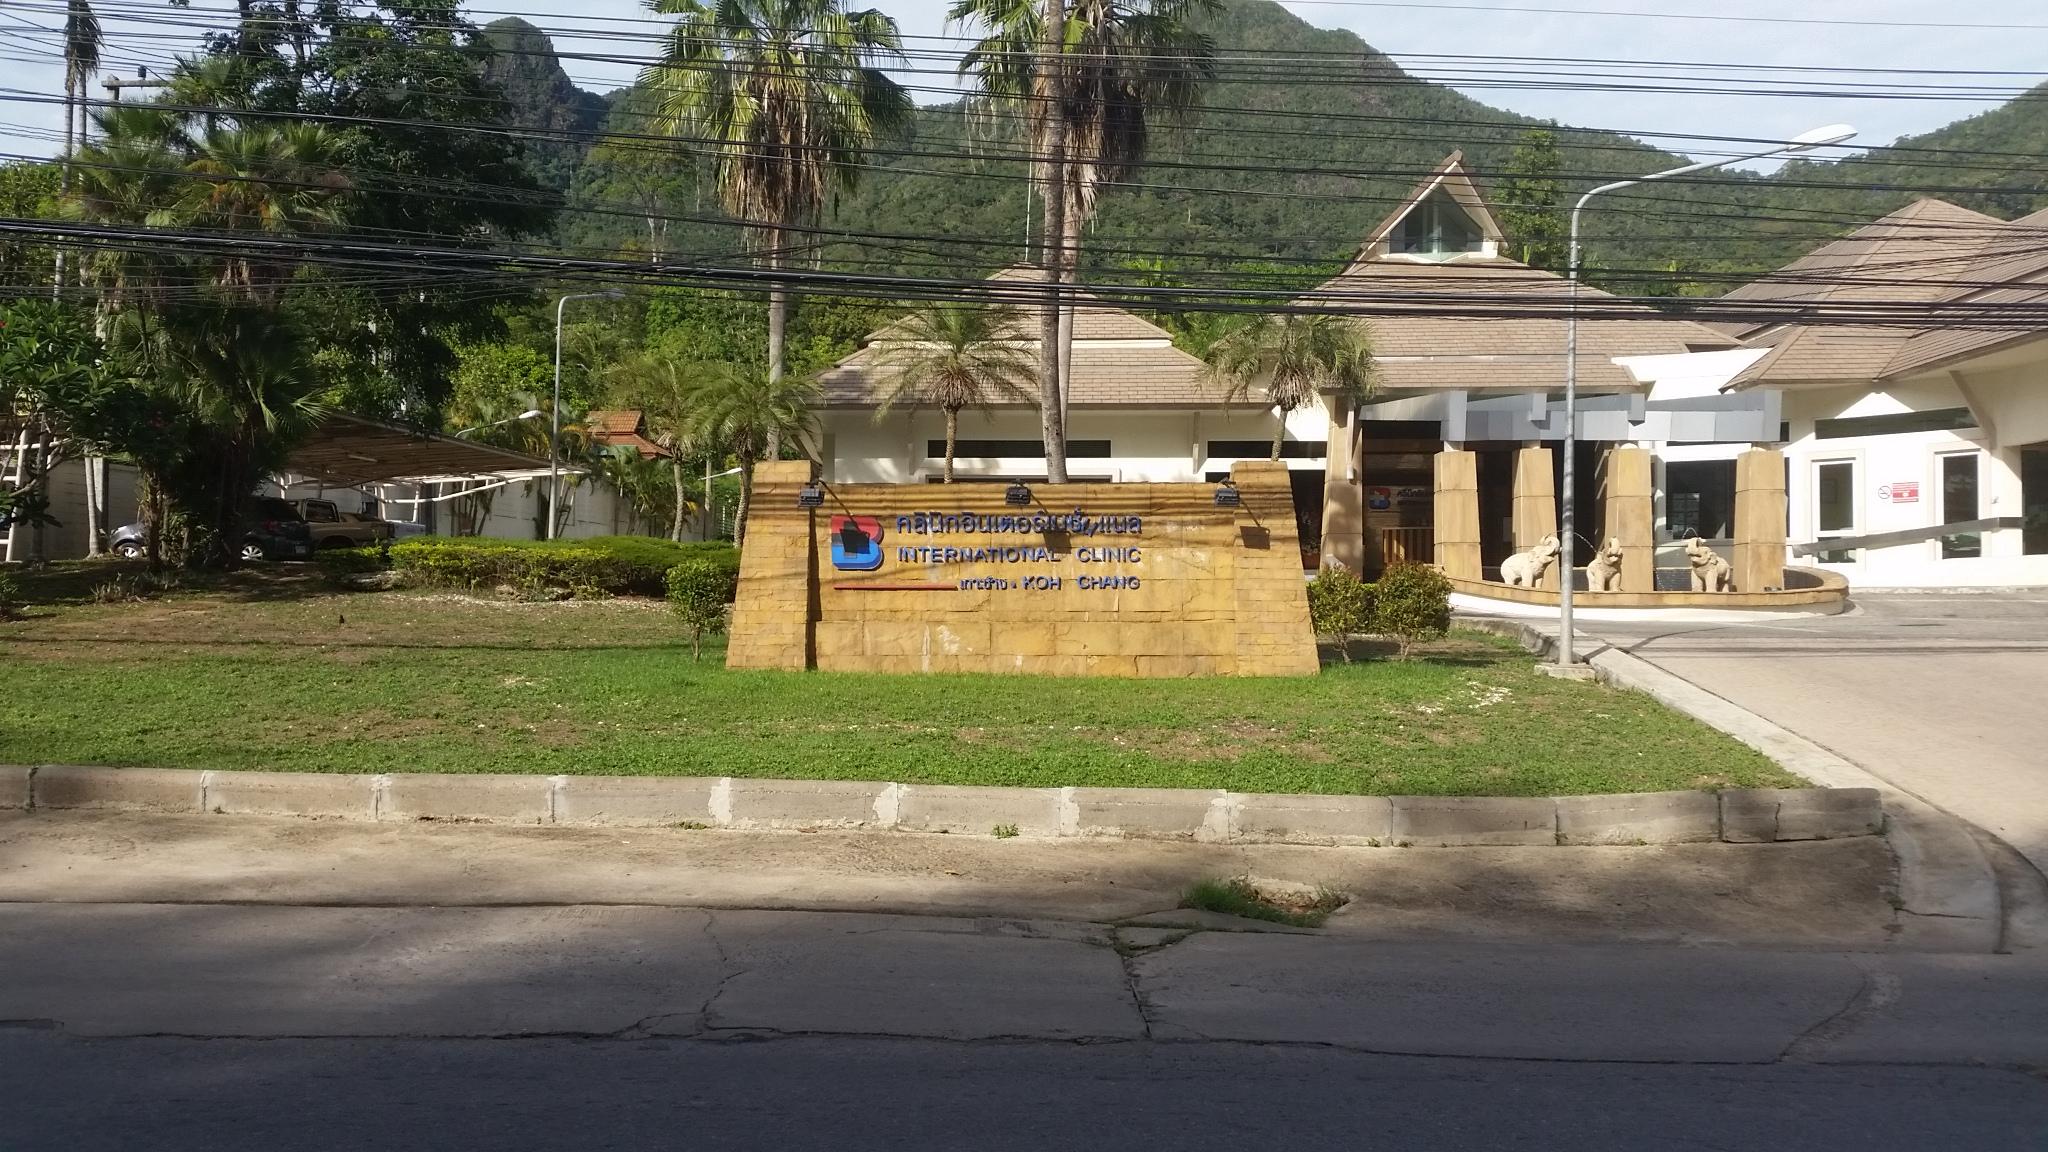 koh chang international clinic outside